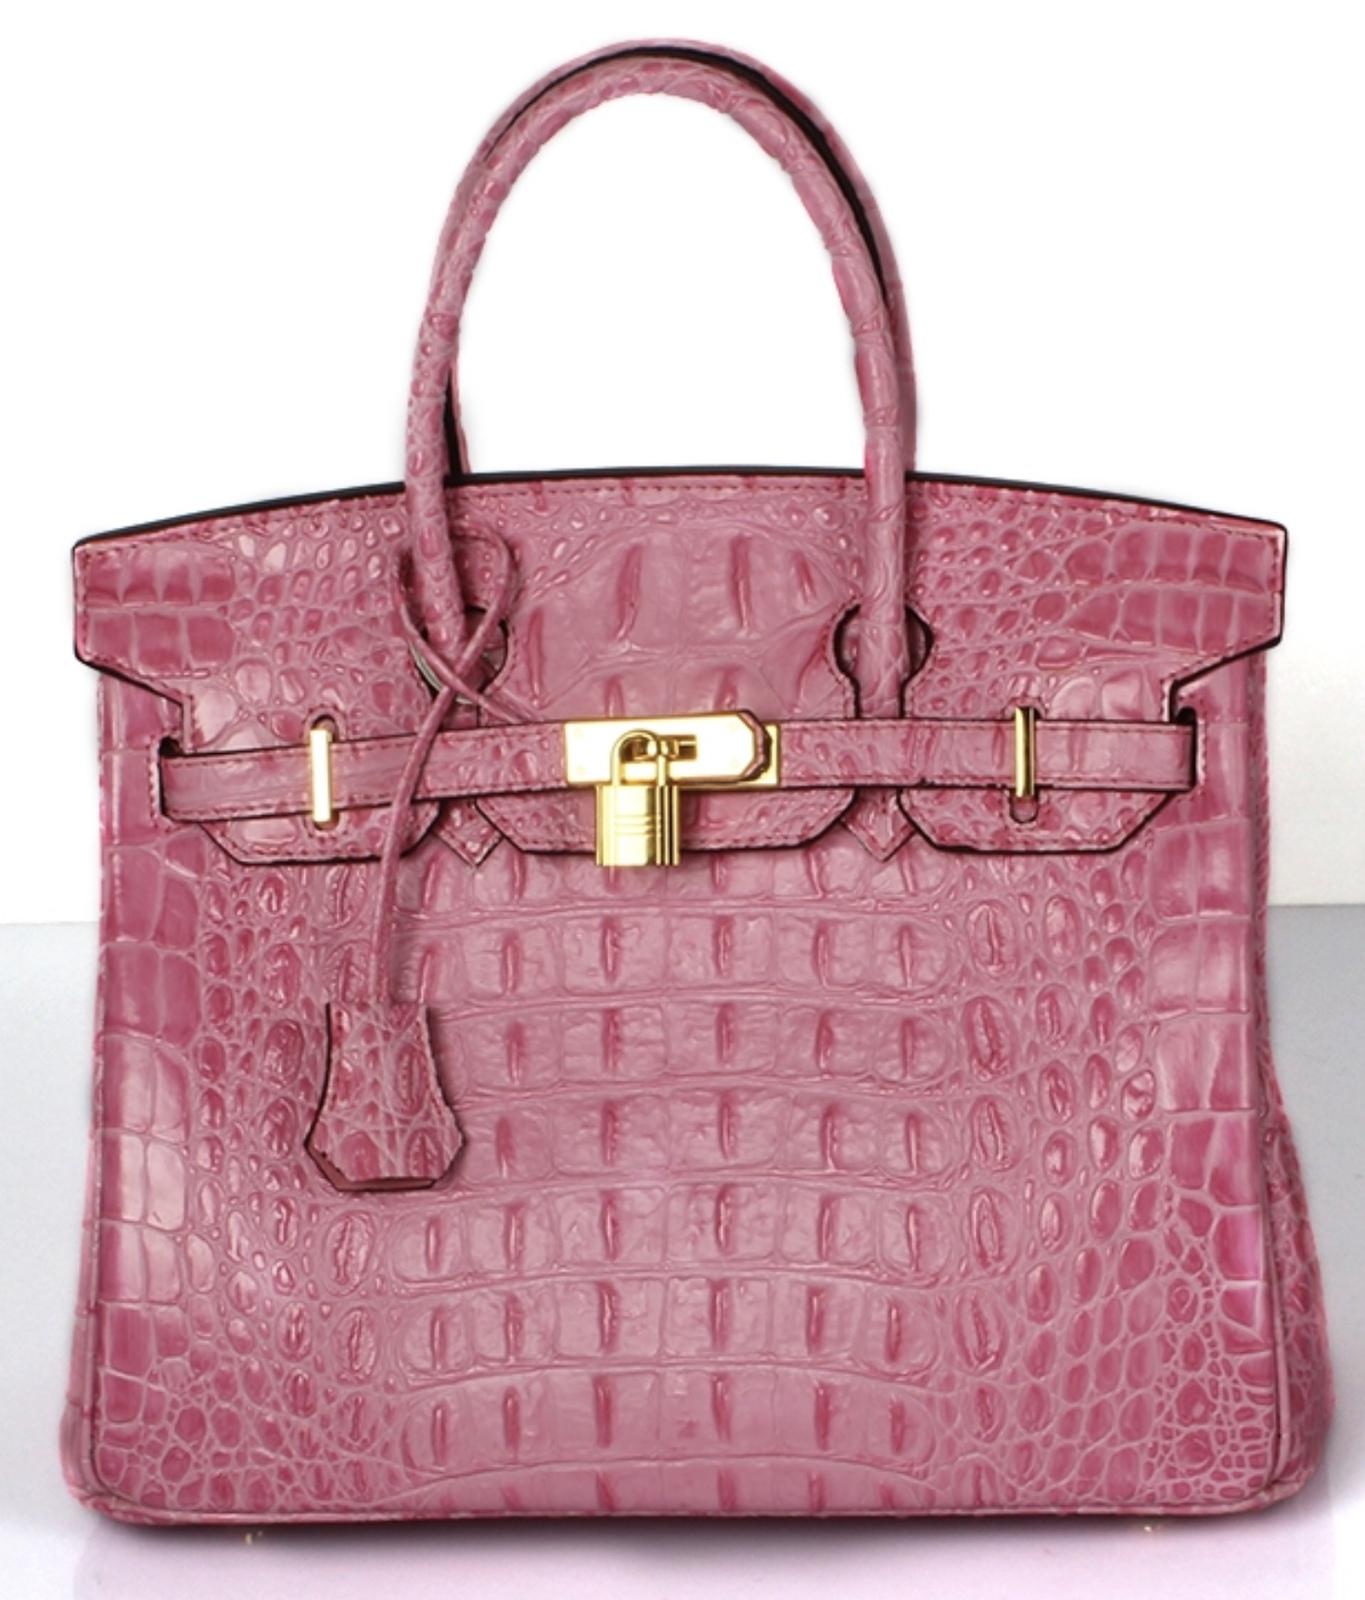 30 cm Crocodile Embossed Italian Leather Birkin Style Satchel Celebrity Handbag